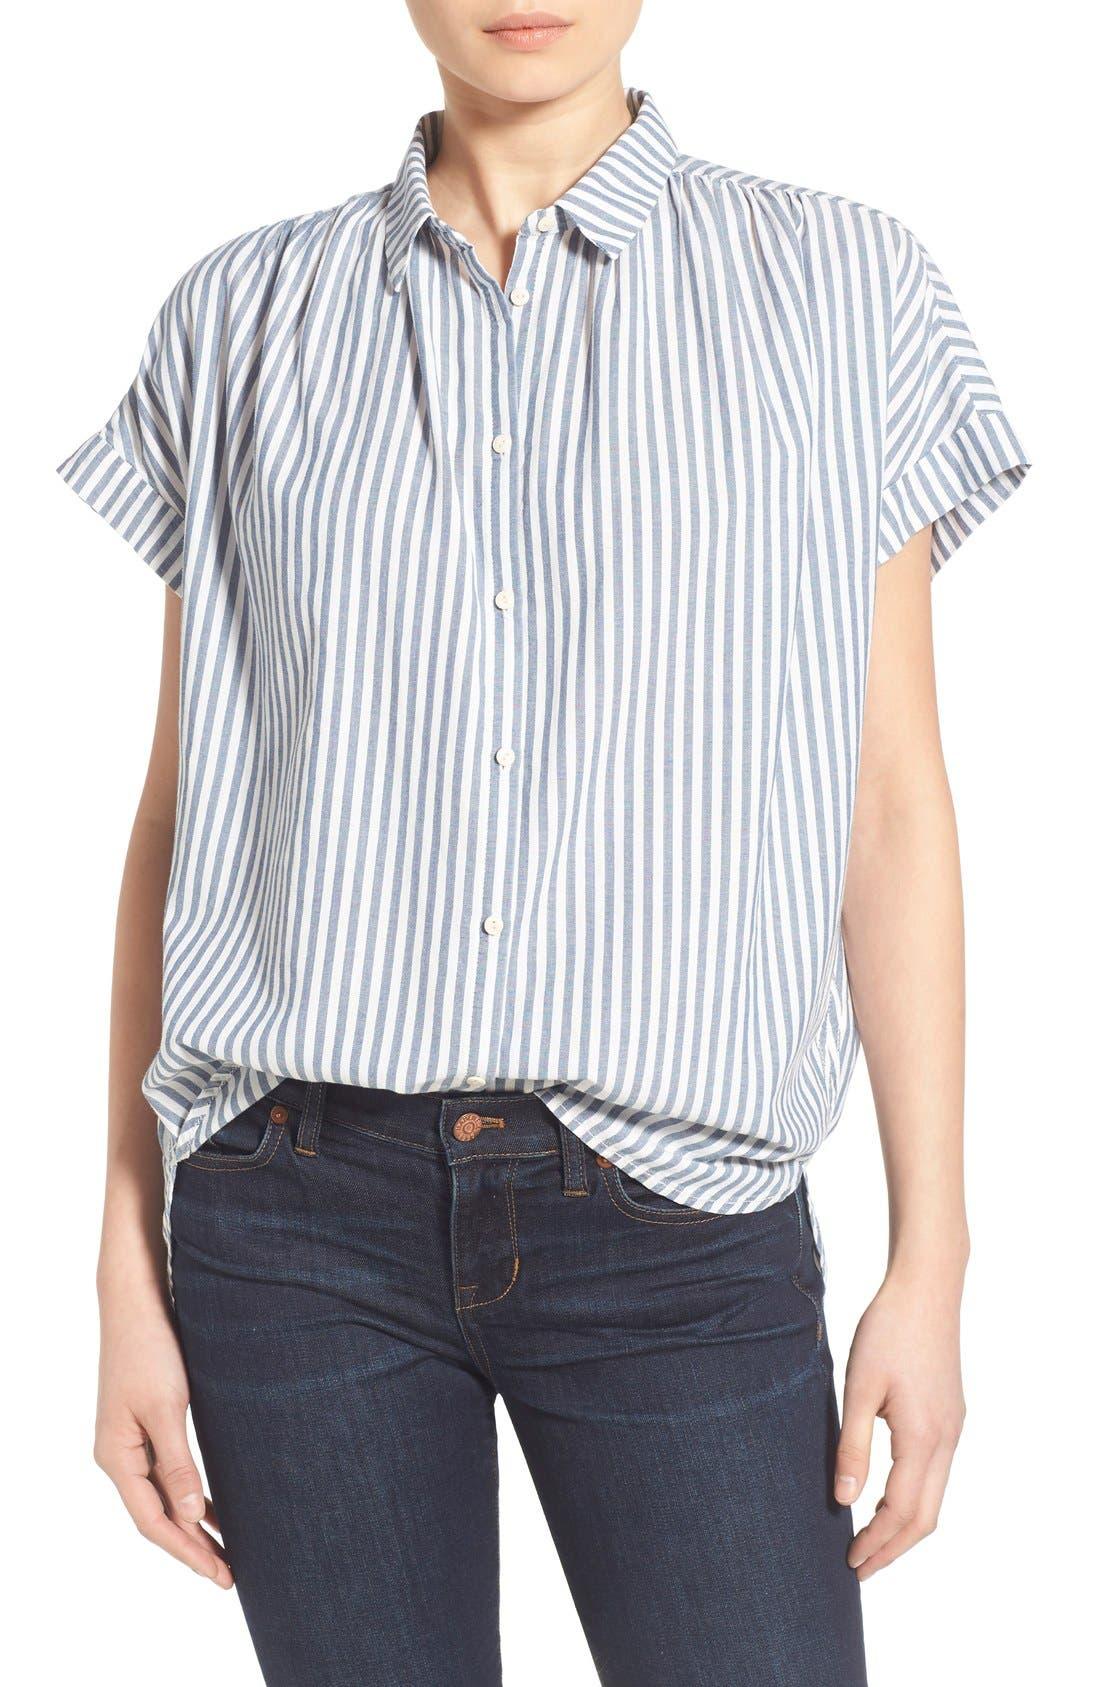 'Central' Stripe Cotton Shirt,                         Main,                         color, Chambray Stripe